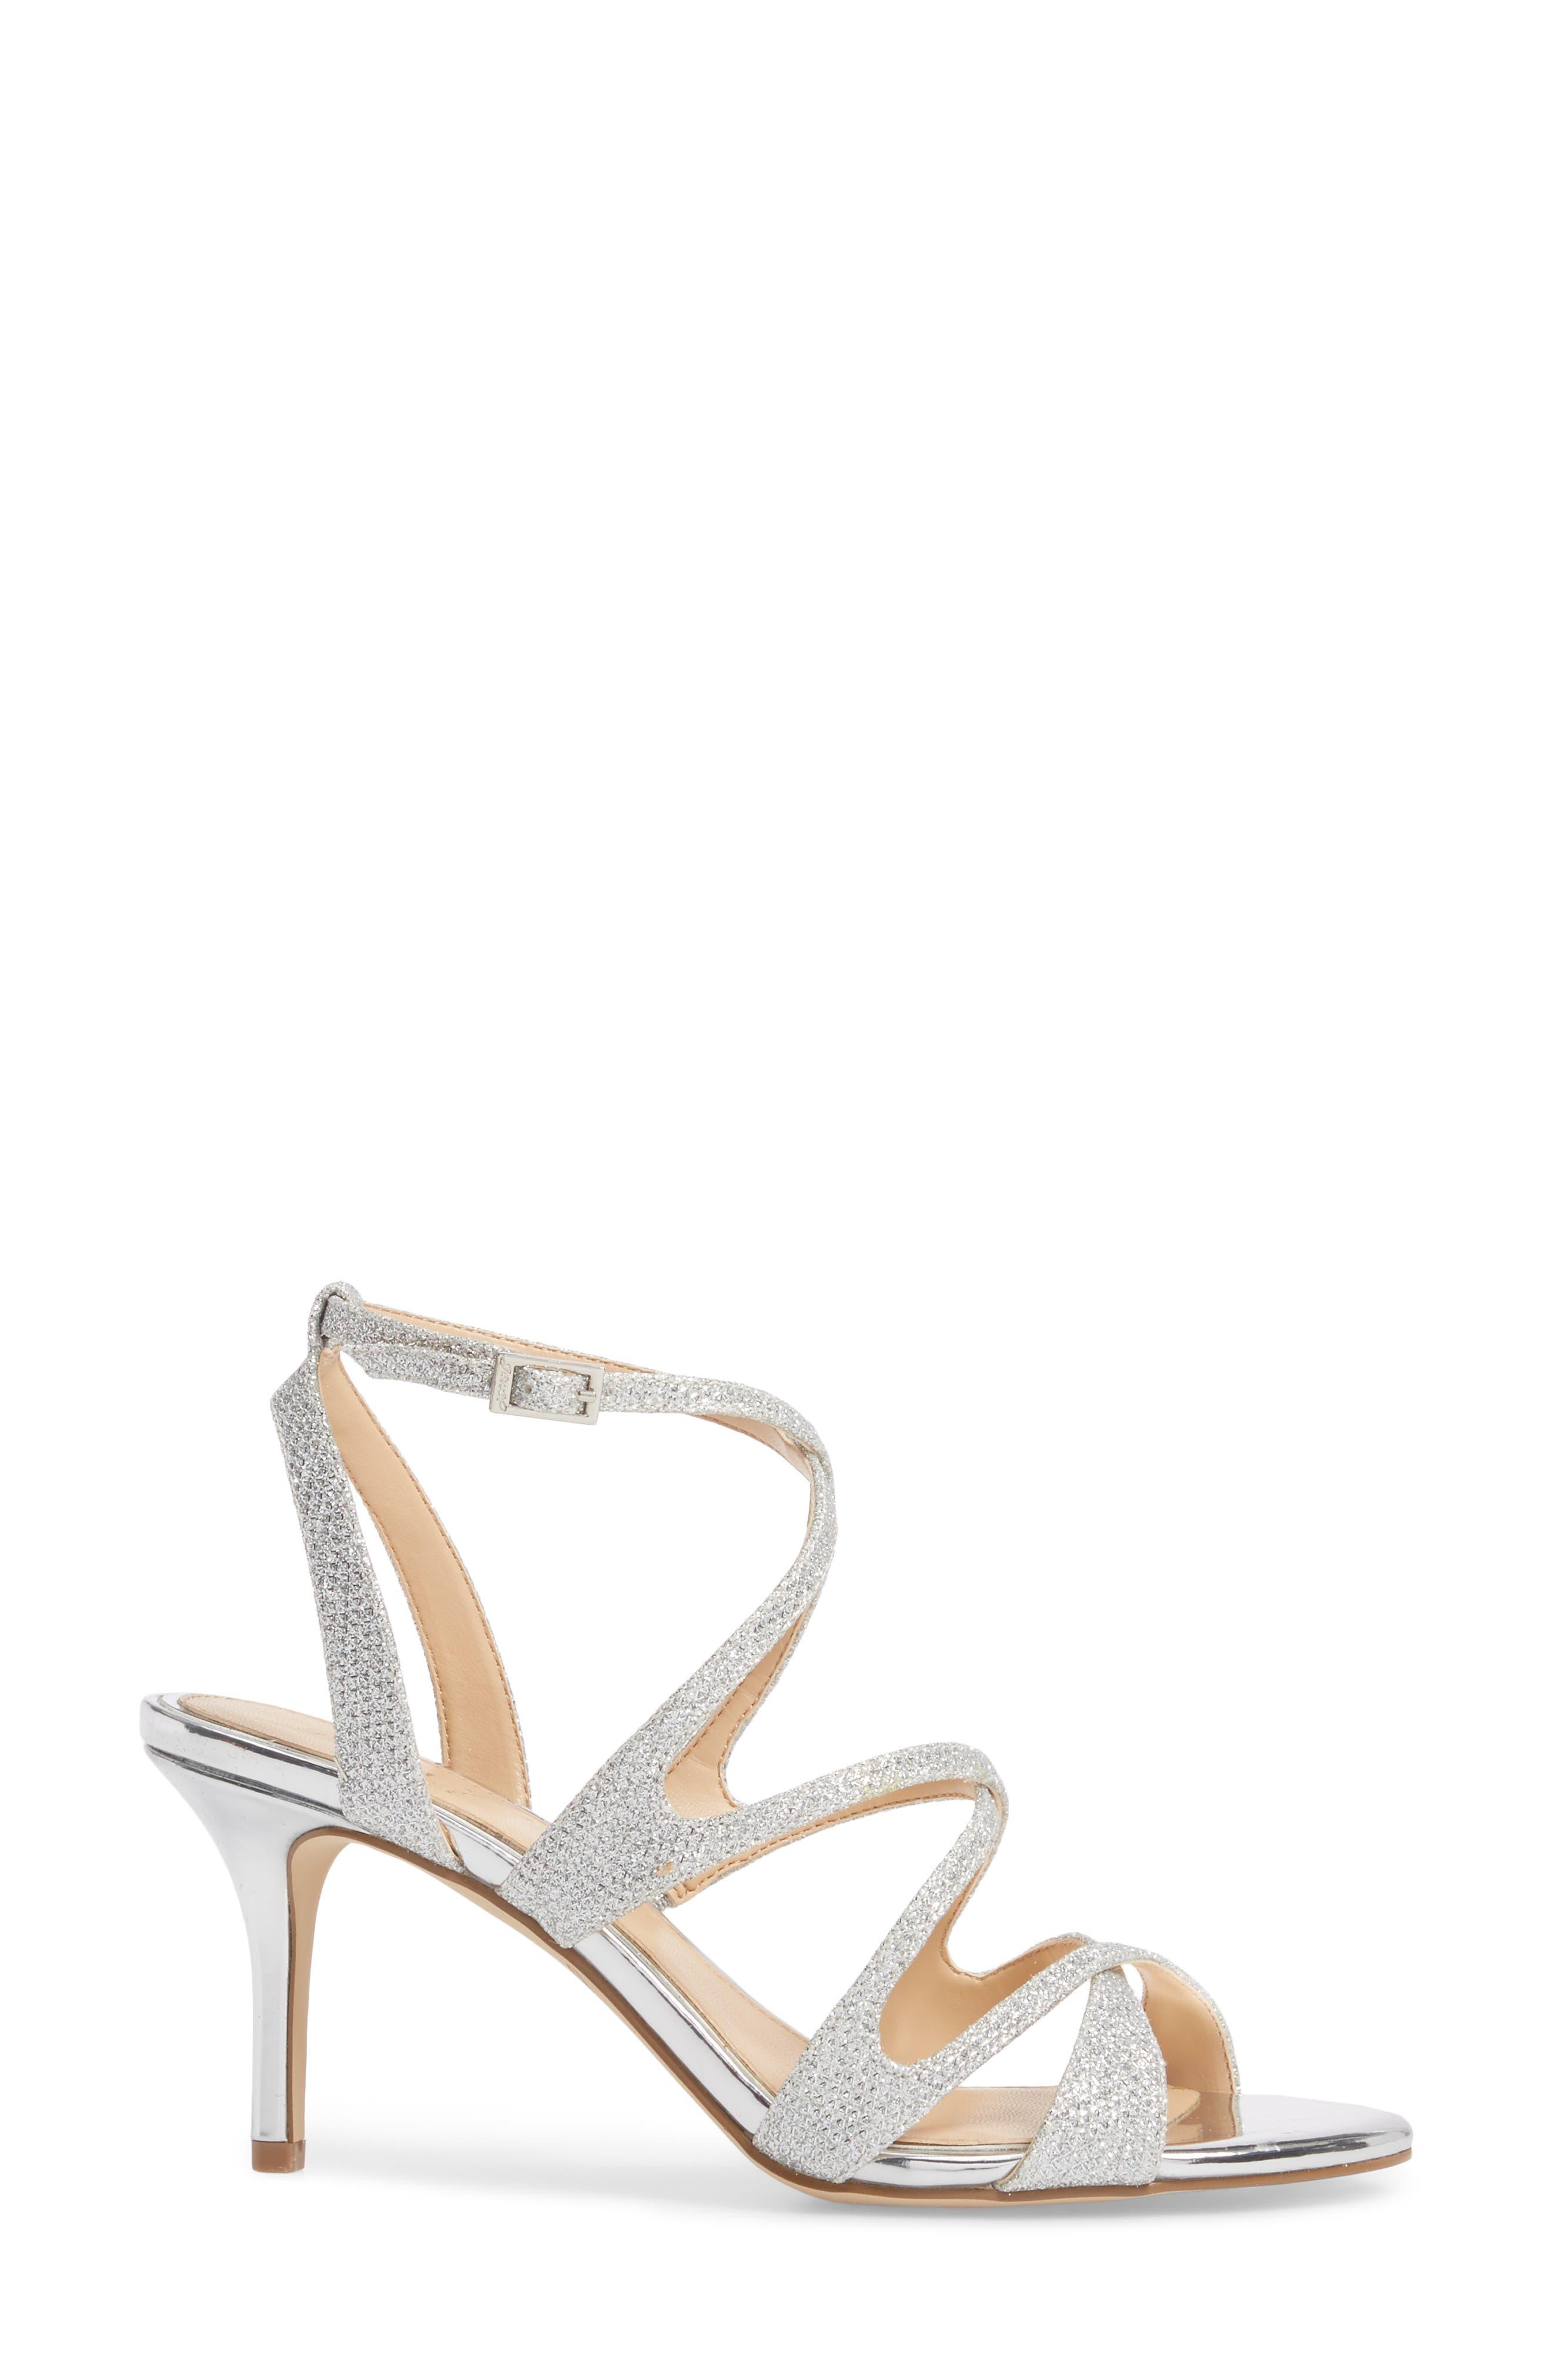 Tasha Glitter Sandal,                             Alternate thumbnail 3, color,                             043